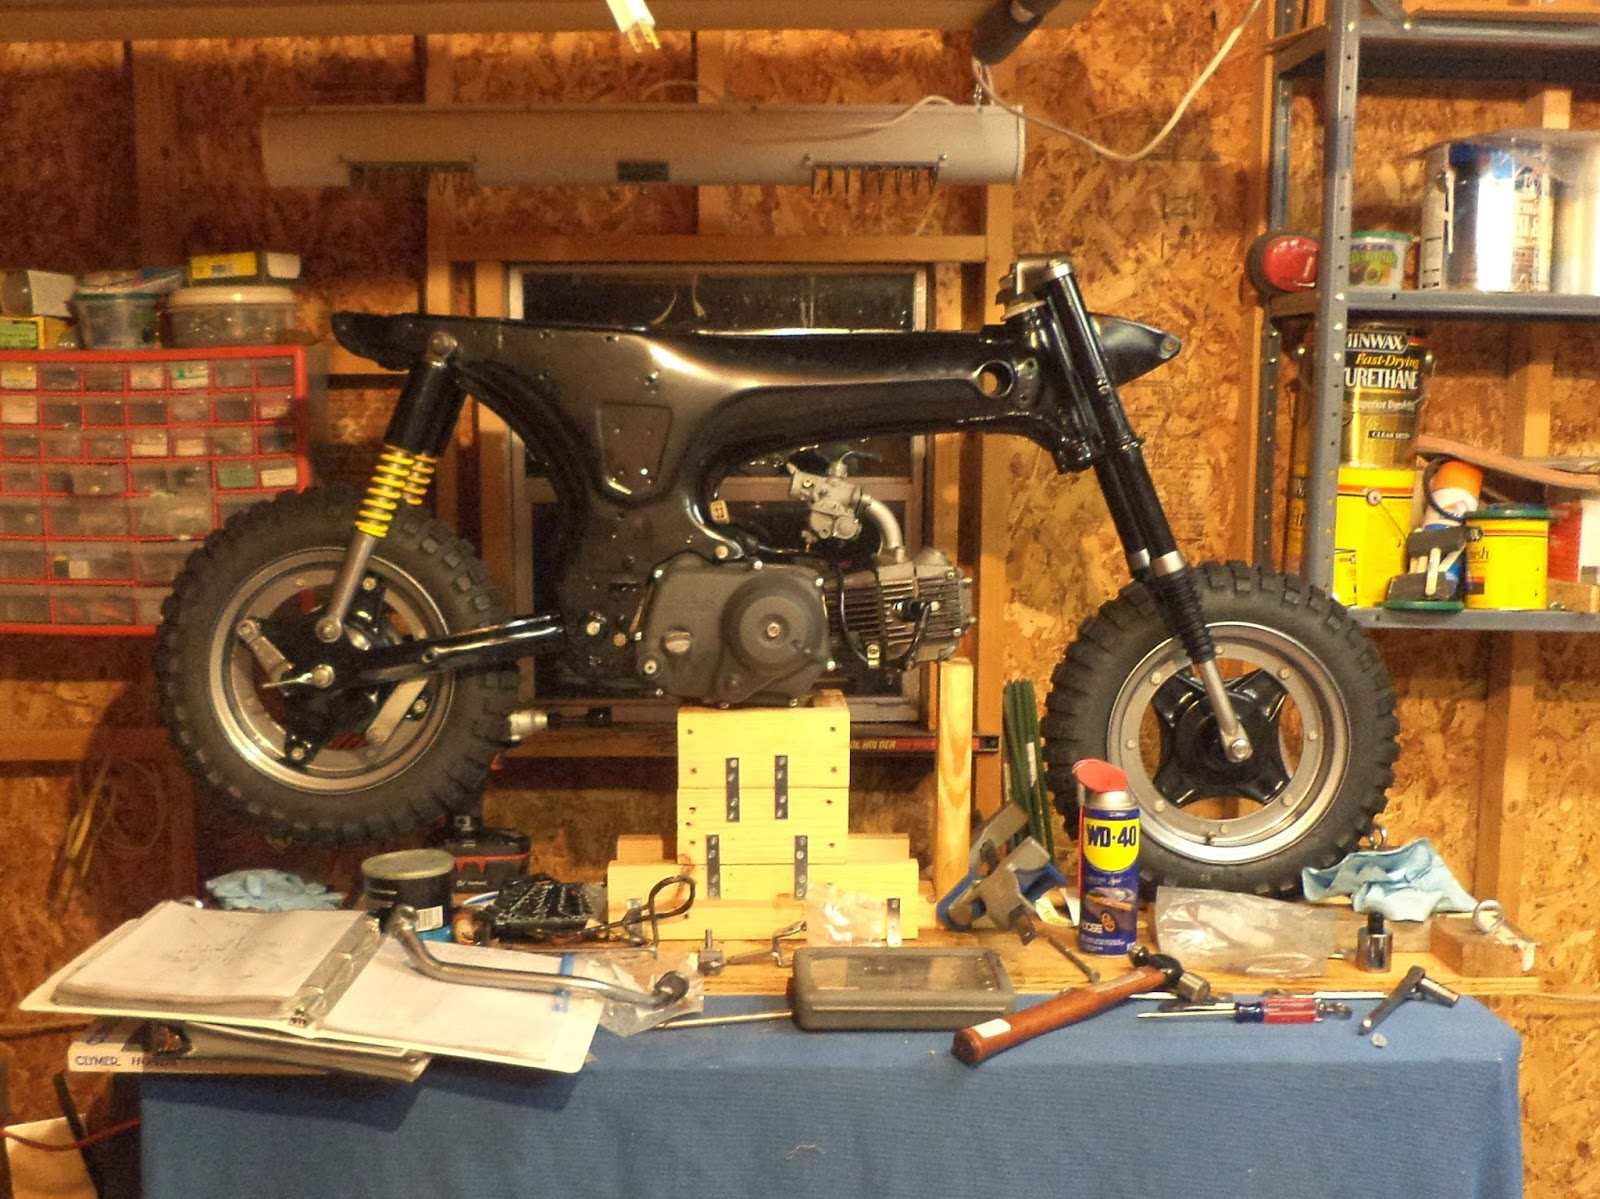 Tear it up, fix it, repeat: CT70 Rear Wheel and Brake